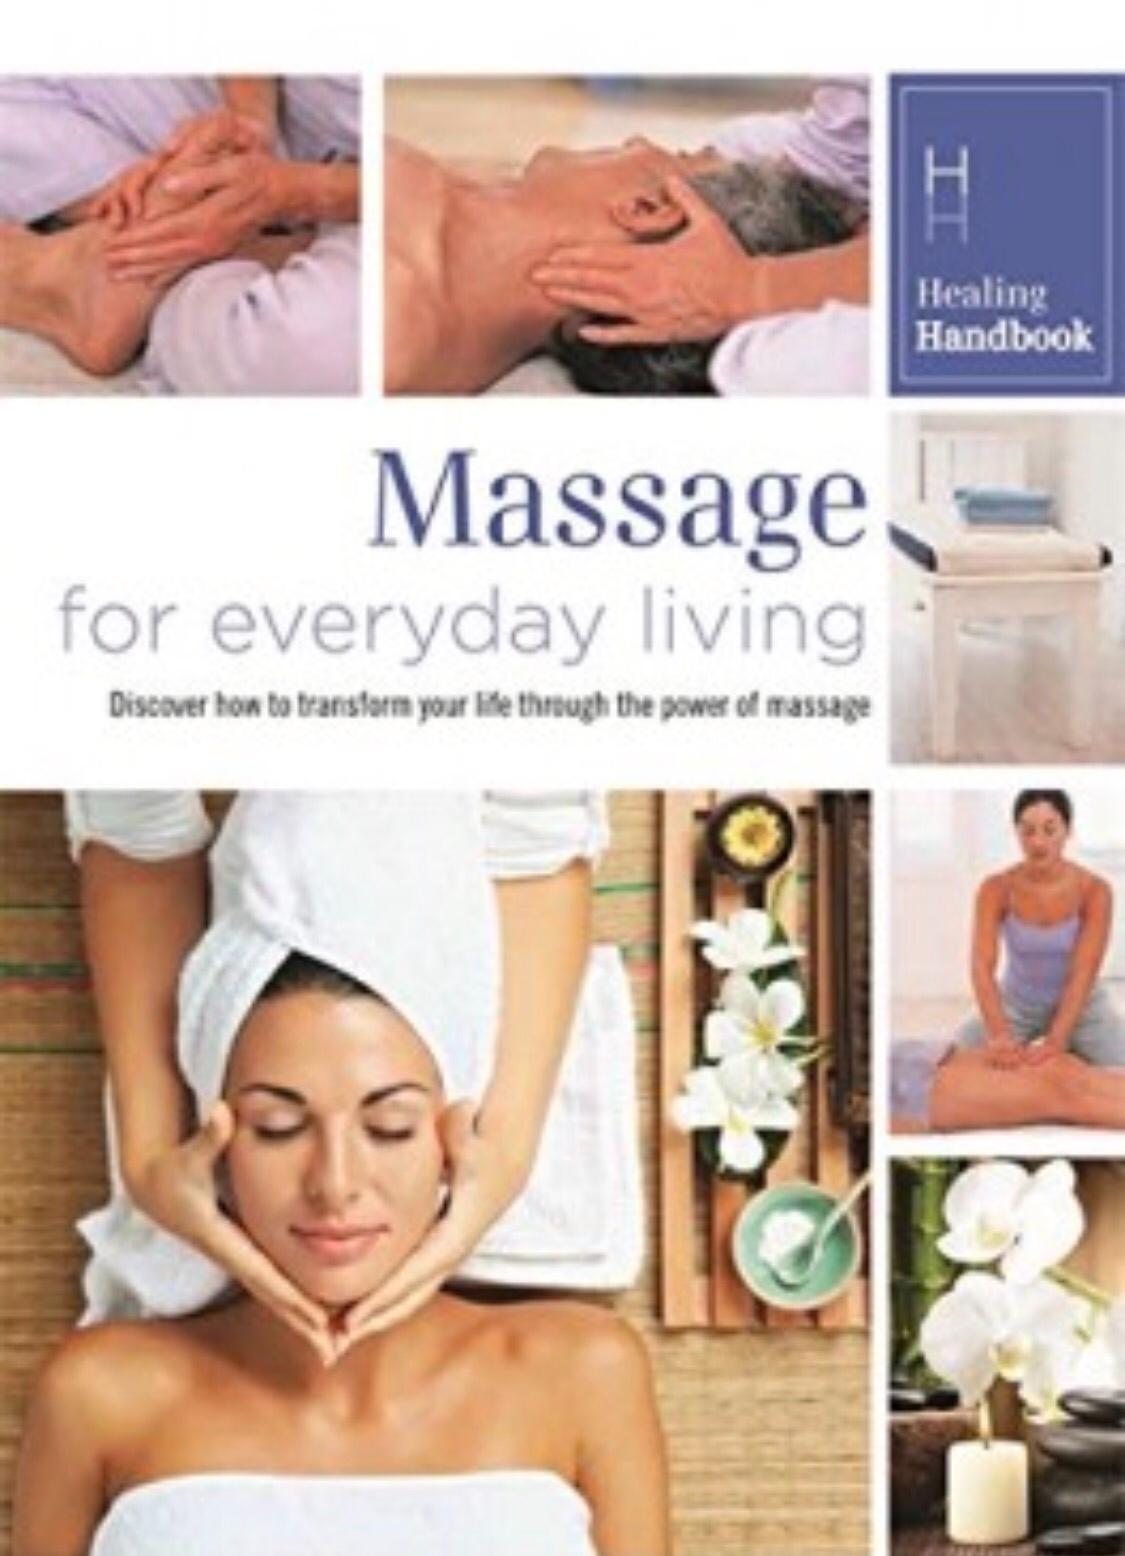 Healing Handbook - Massage for Everyday Living